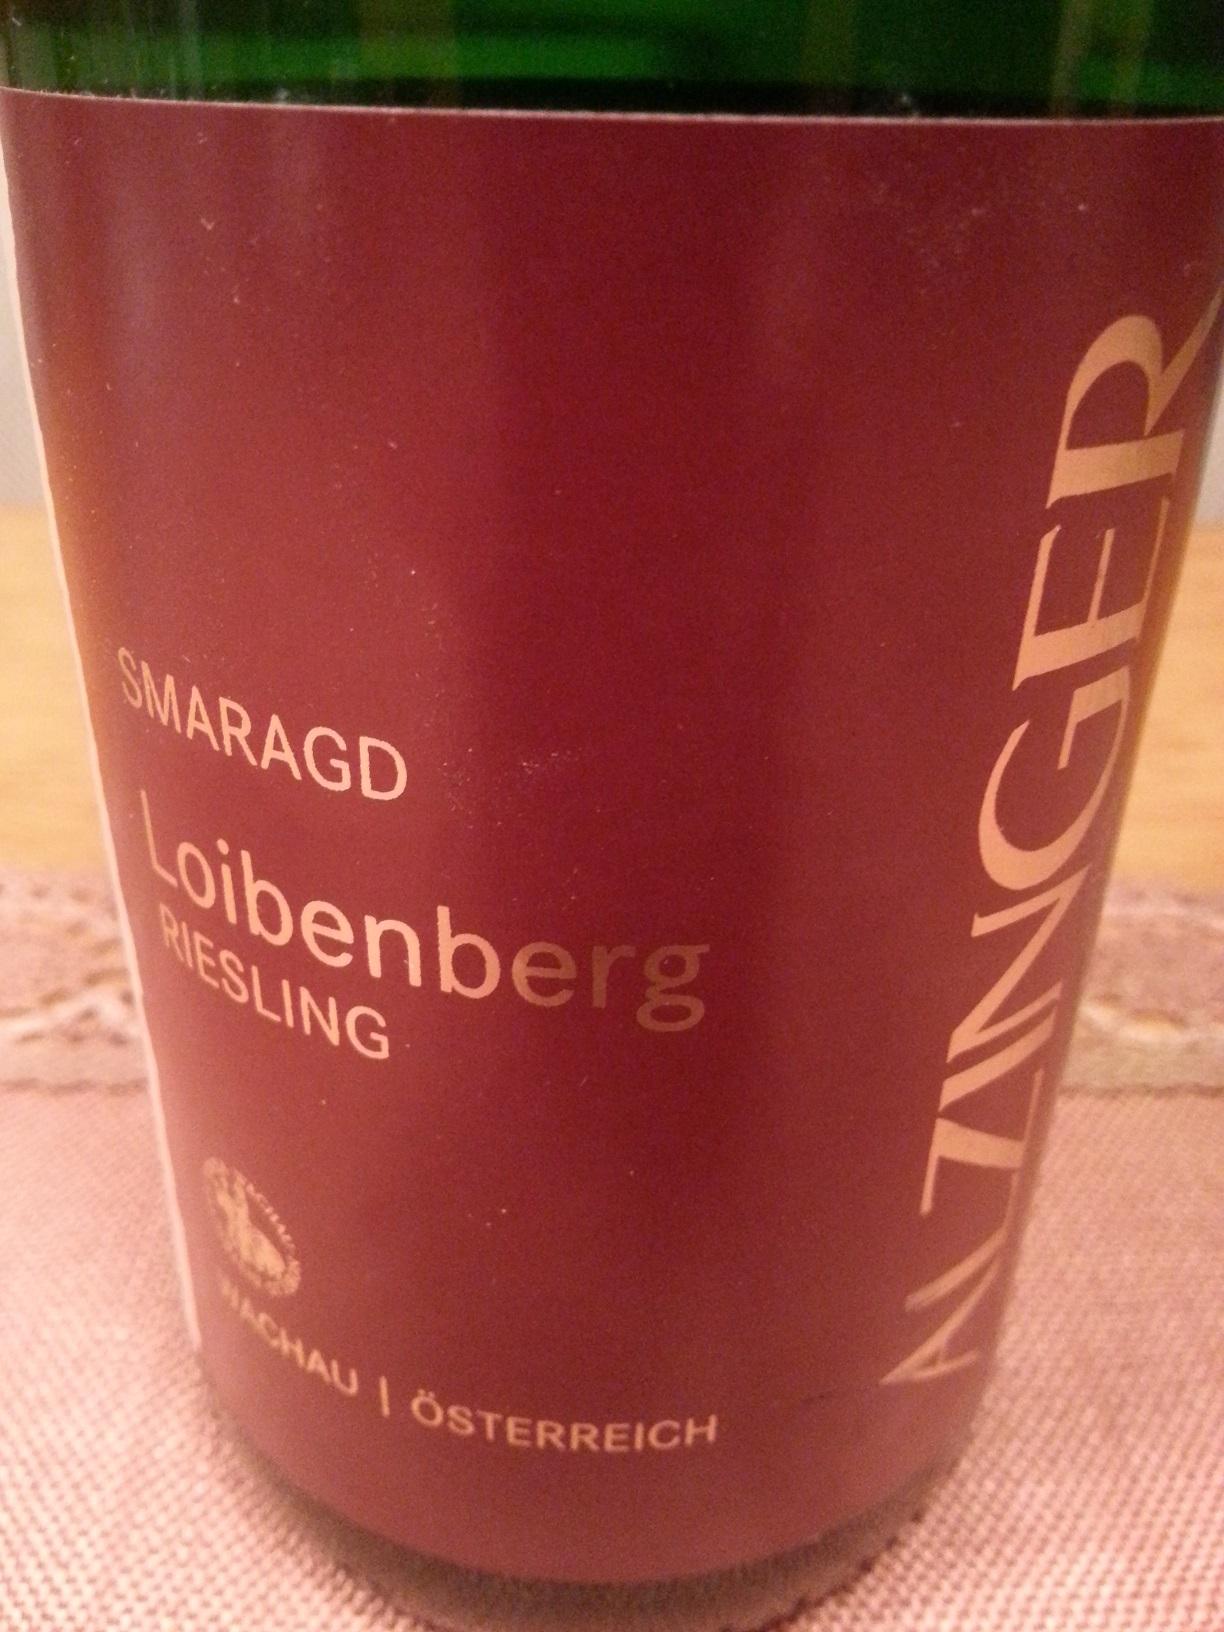 2010 Riesling Smaragd Loibenberg | Alzinger